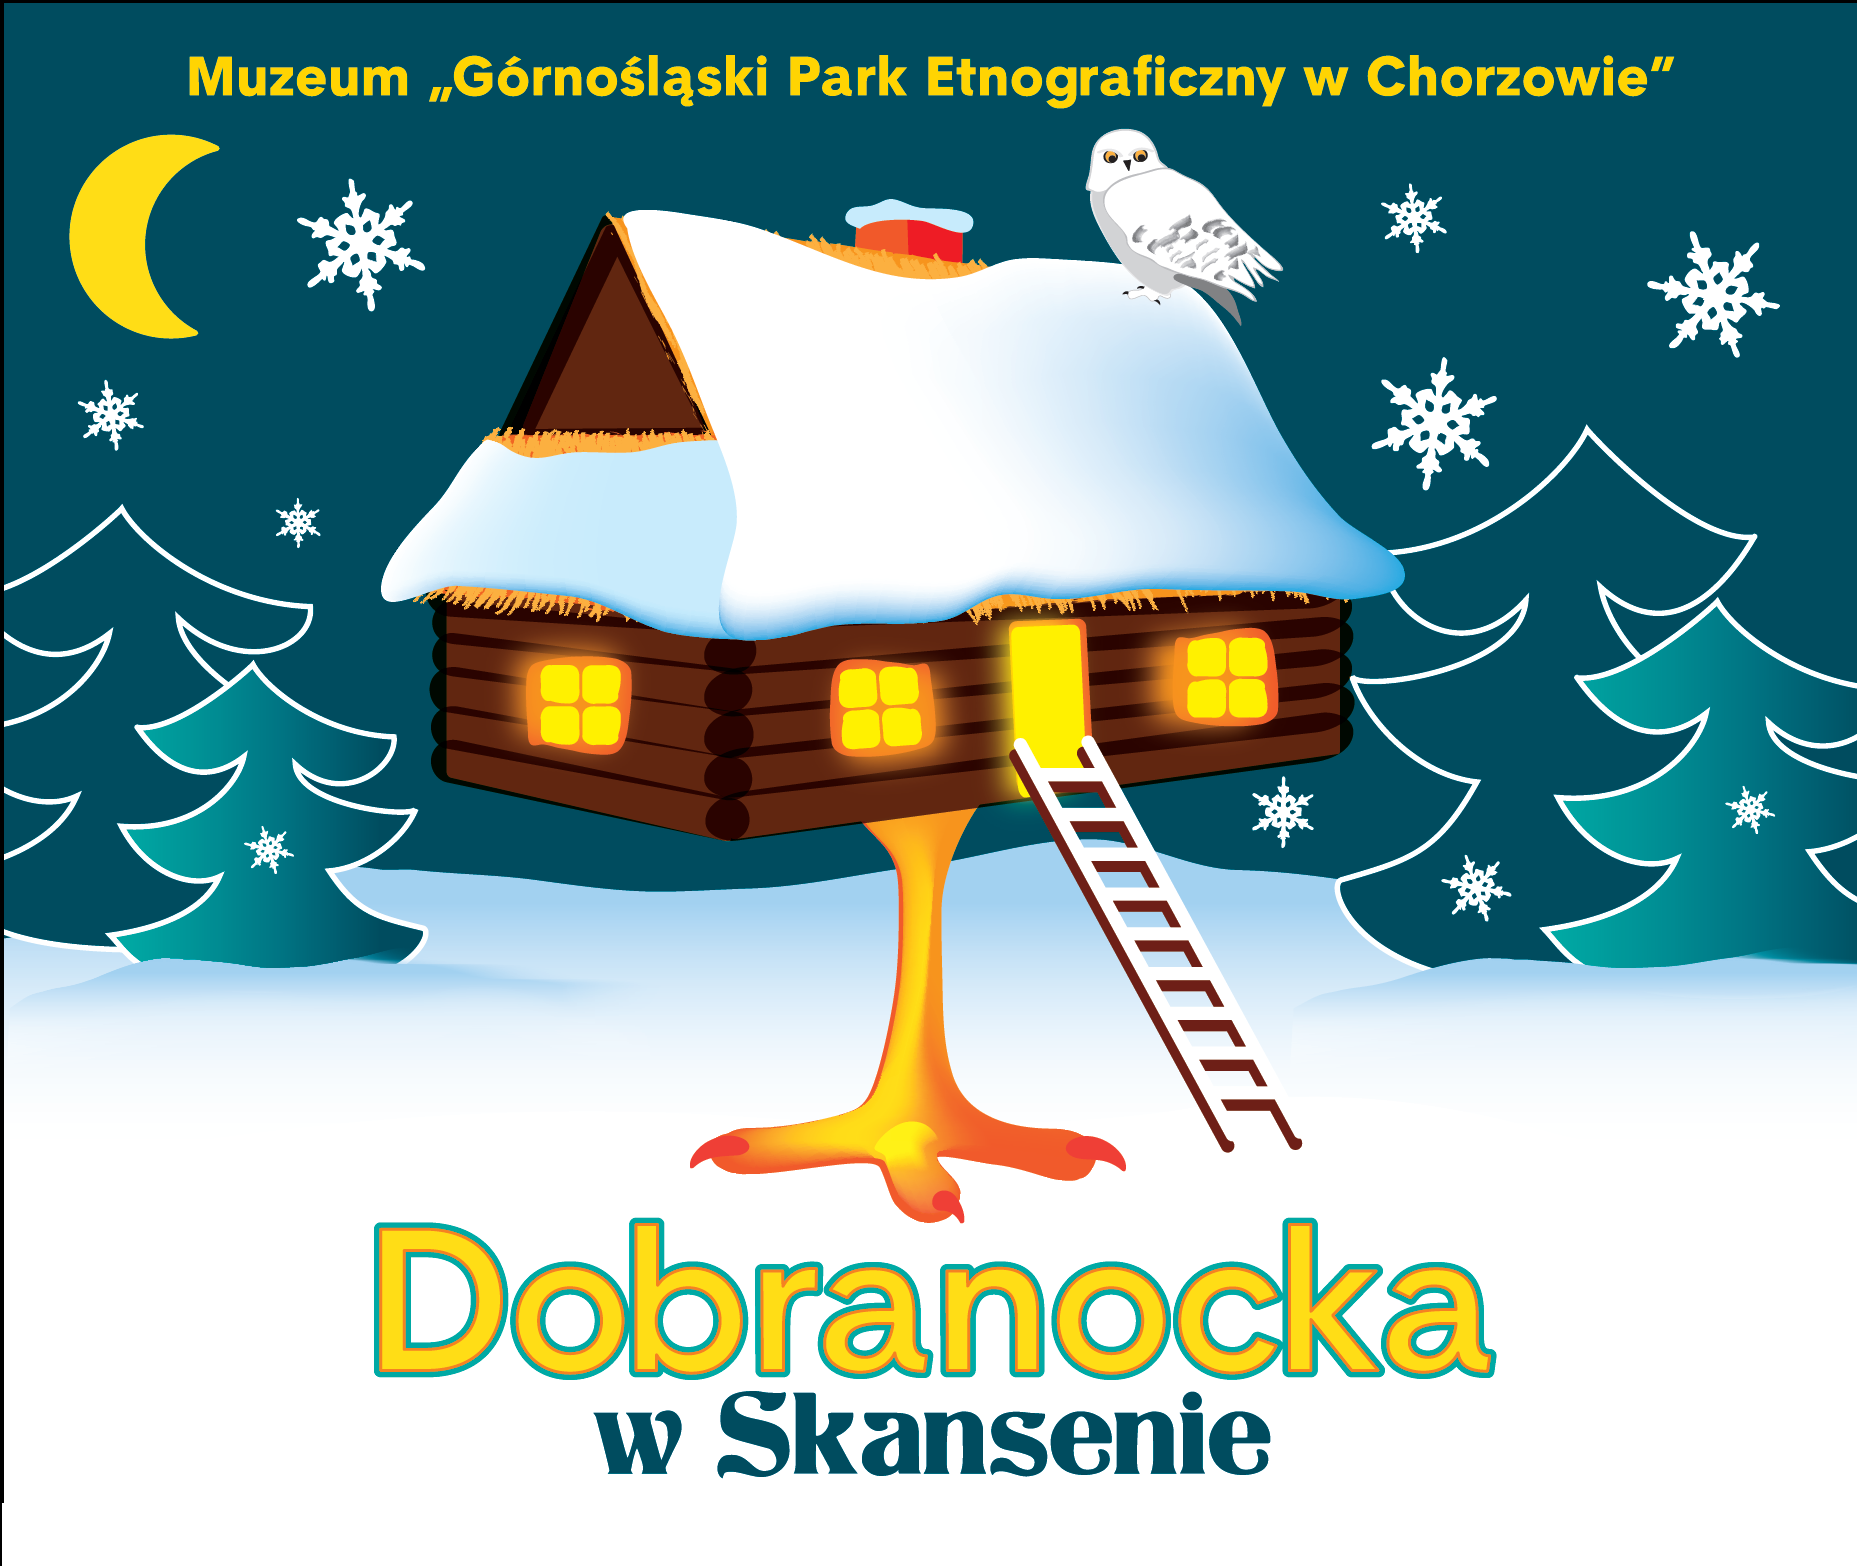 Dobranocka w Skansenie - ilustracja - skansen Chorzów